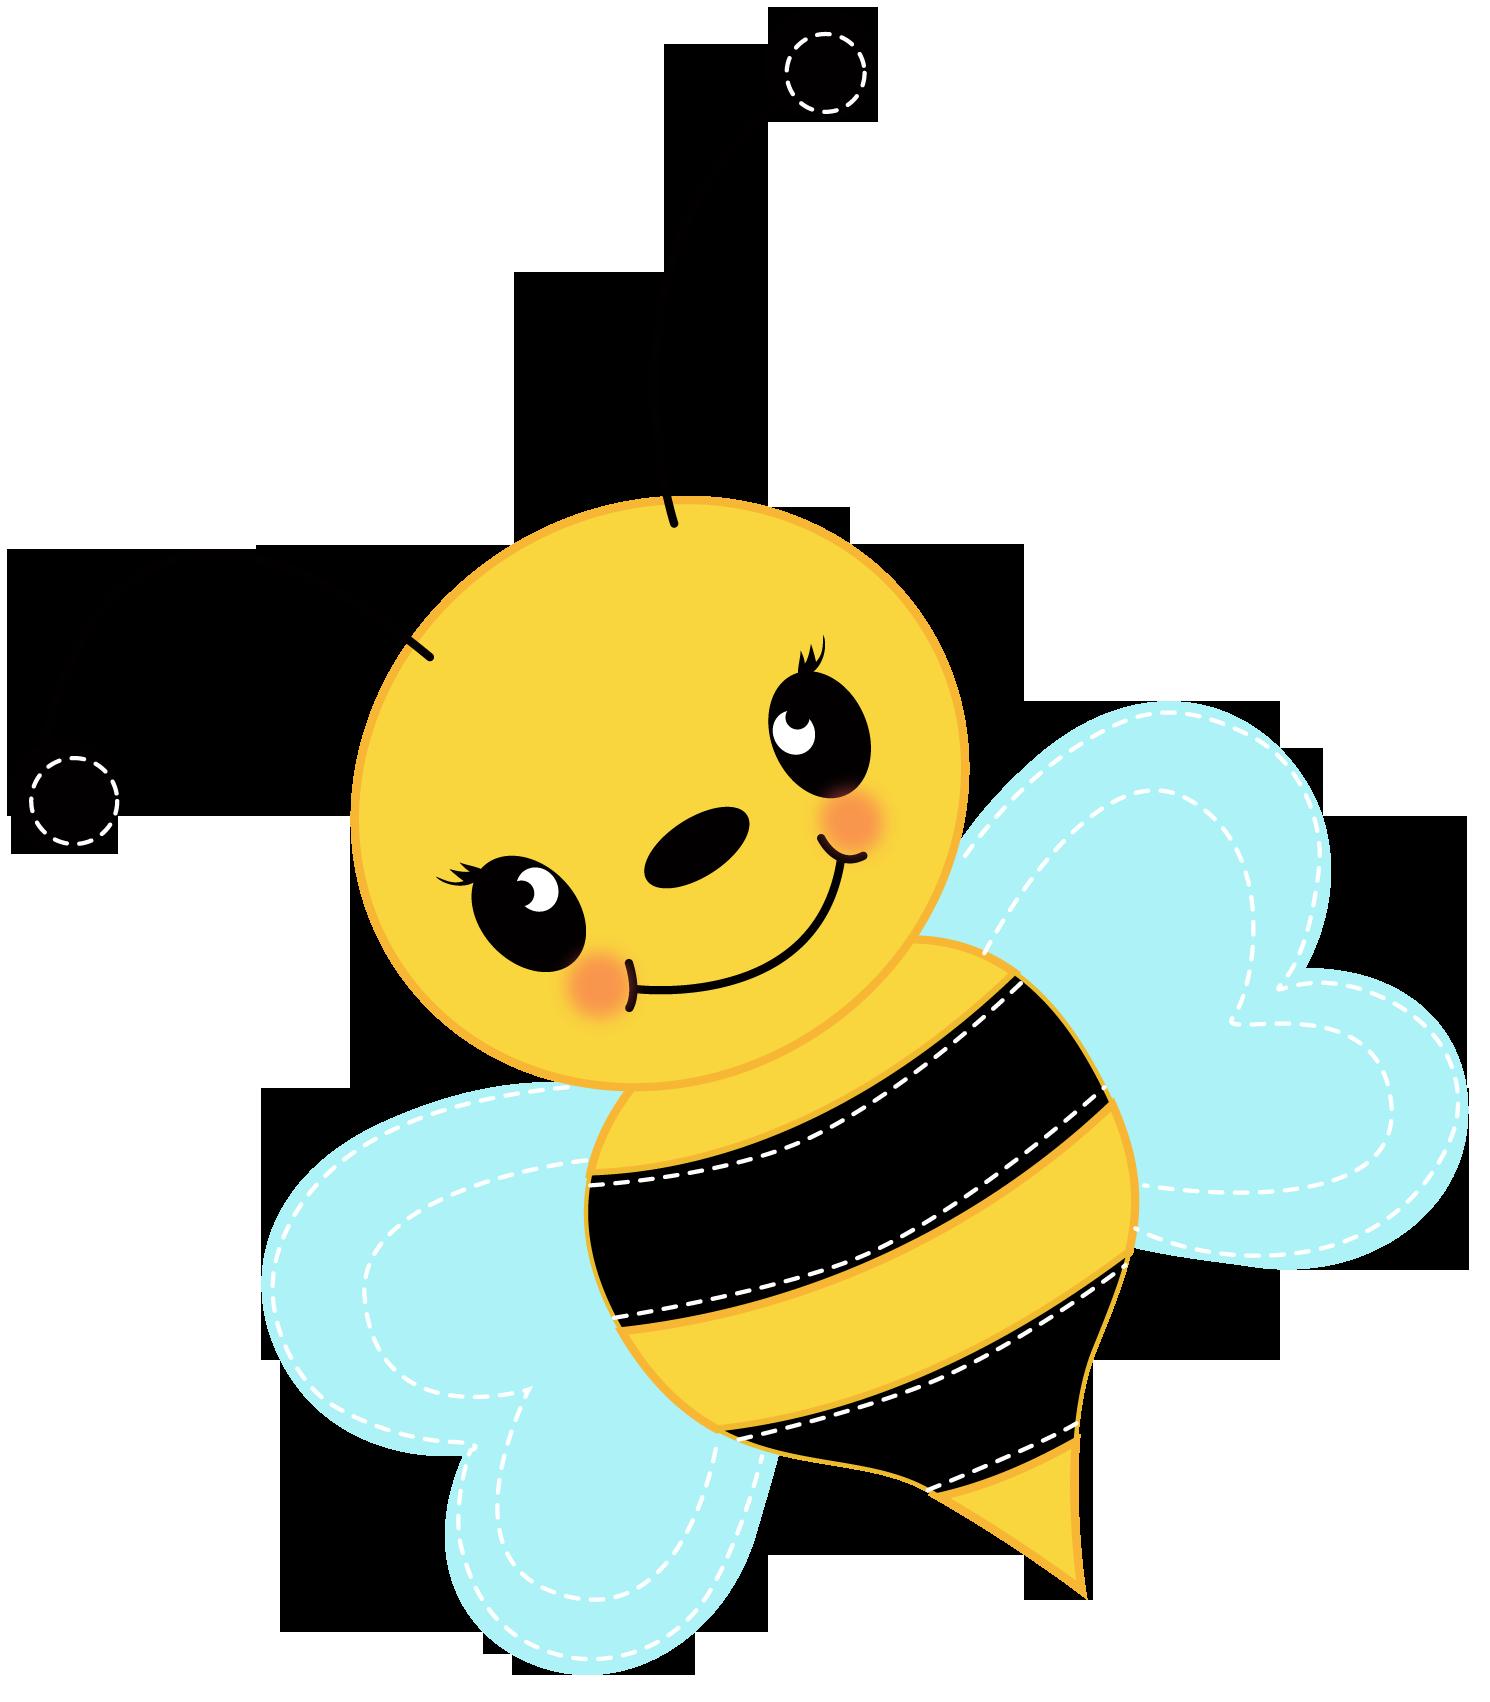 clip art freeuse stock Bumble clipart boy. Imagination art pinterest bees.